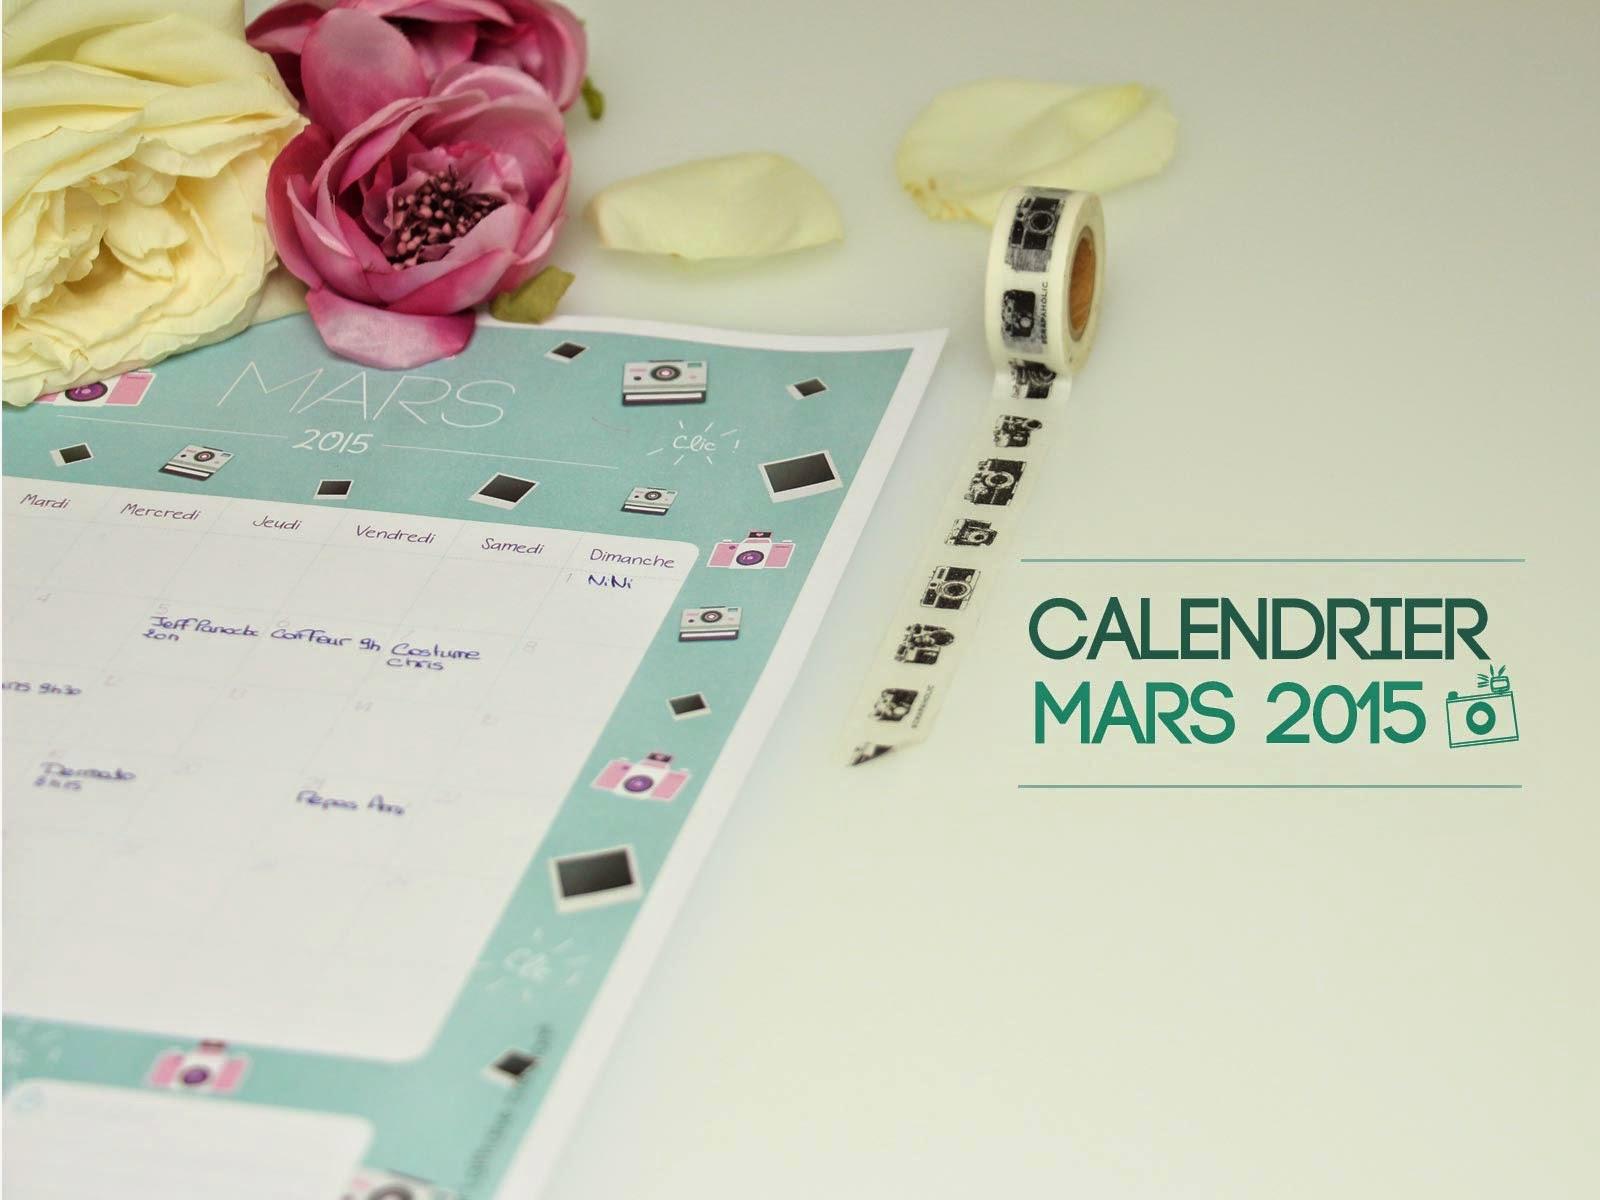 calendrier mars 2015 gratuit